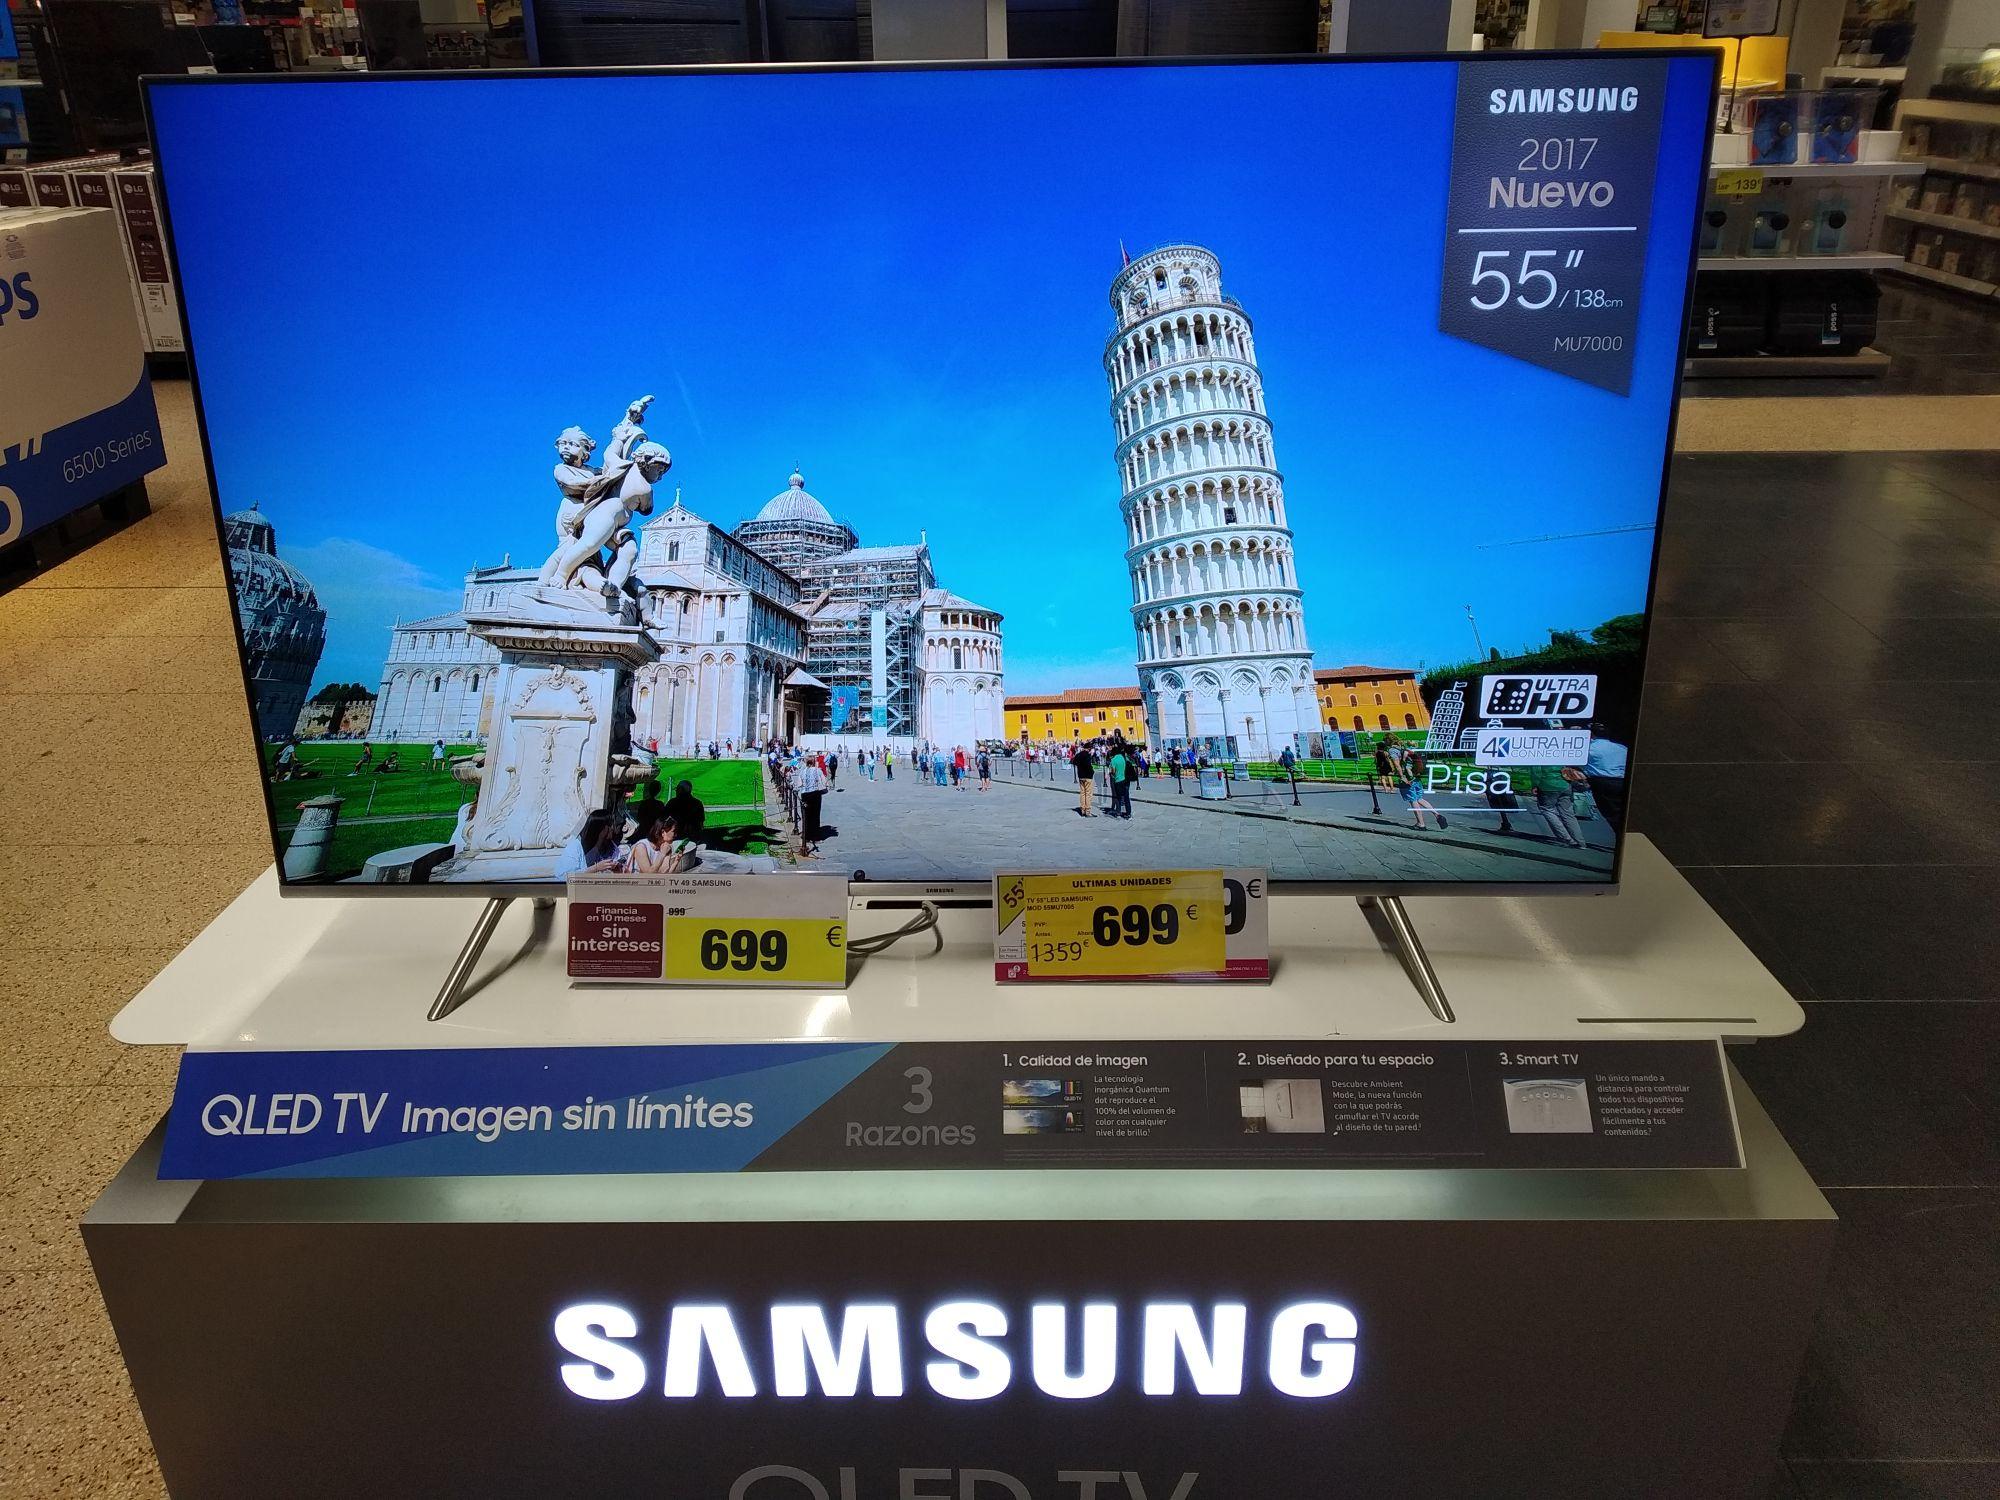 TV Samsung LED 55' Carrefour Montigalà